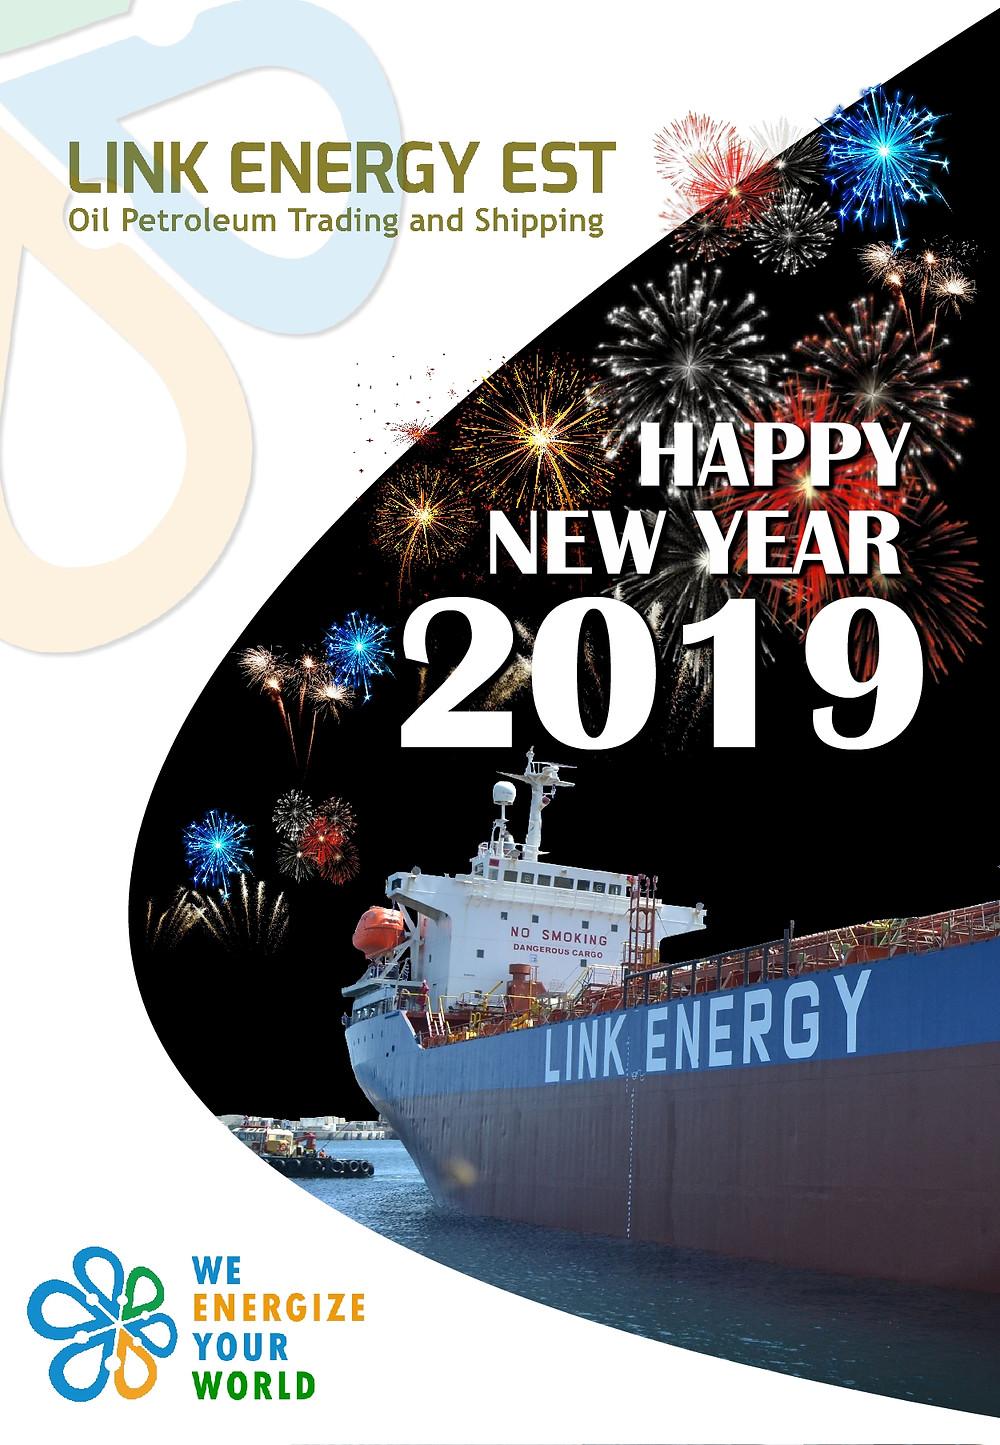 Link Energy Est., Happy New Year 2019